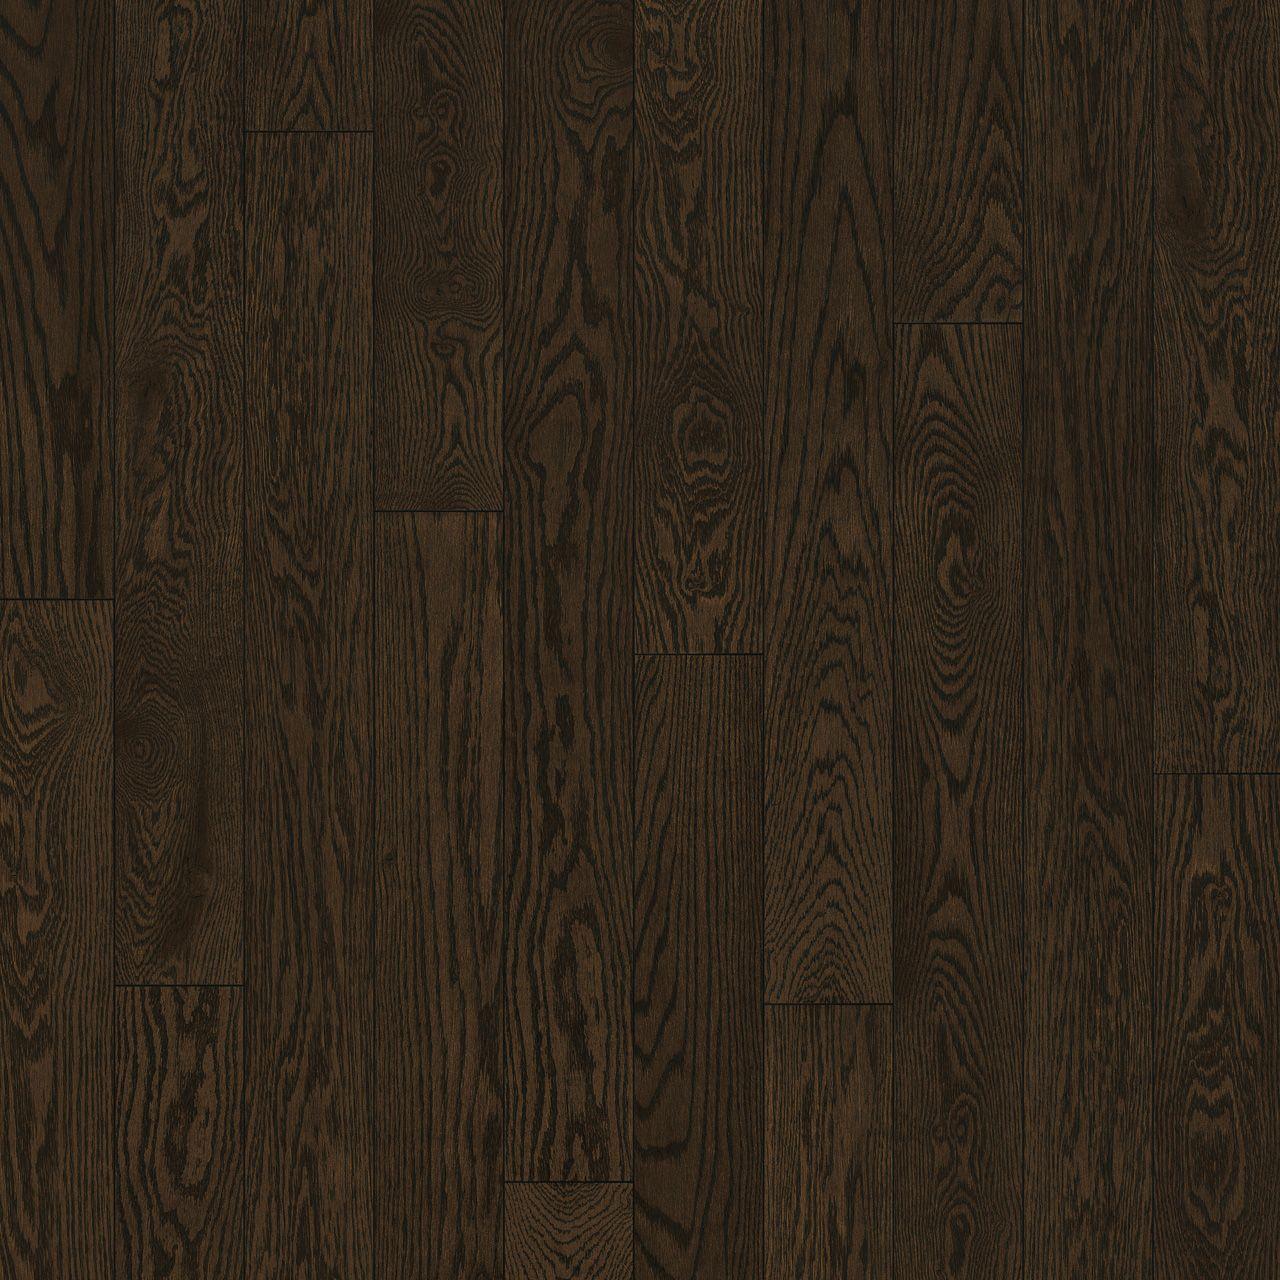 red oak, chocolat, oiled hardwood flooring Preverco